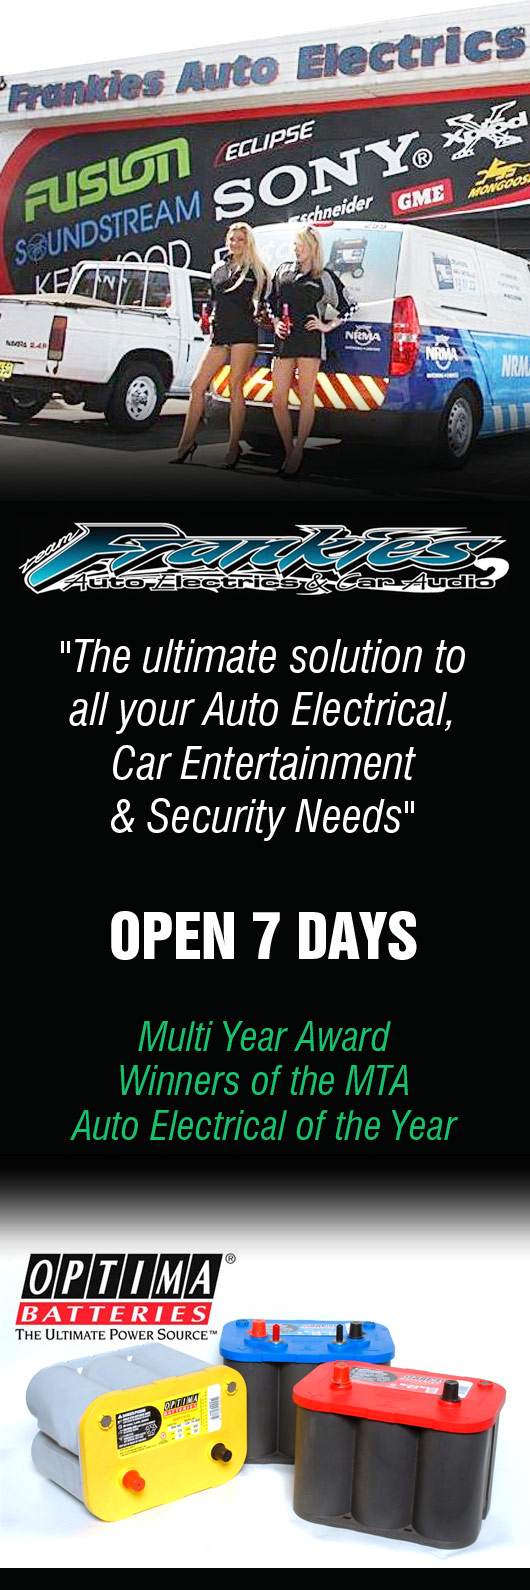 Frankies Auto Electrics & Car Audio - Auto Electrician Services